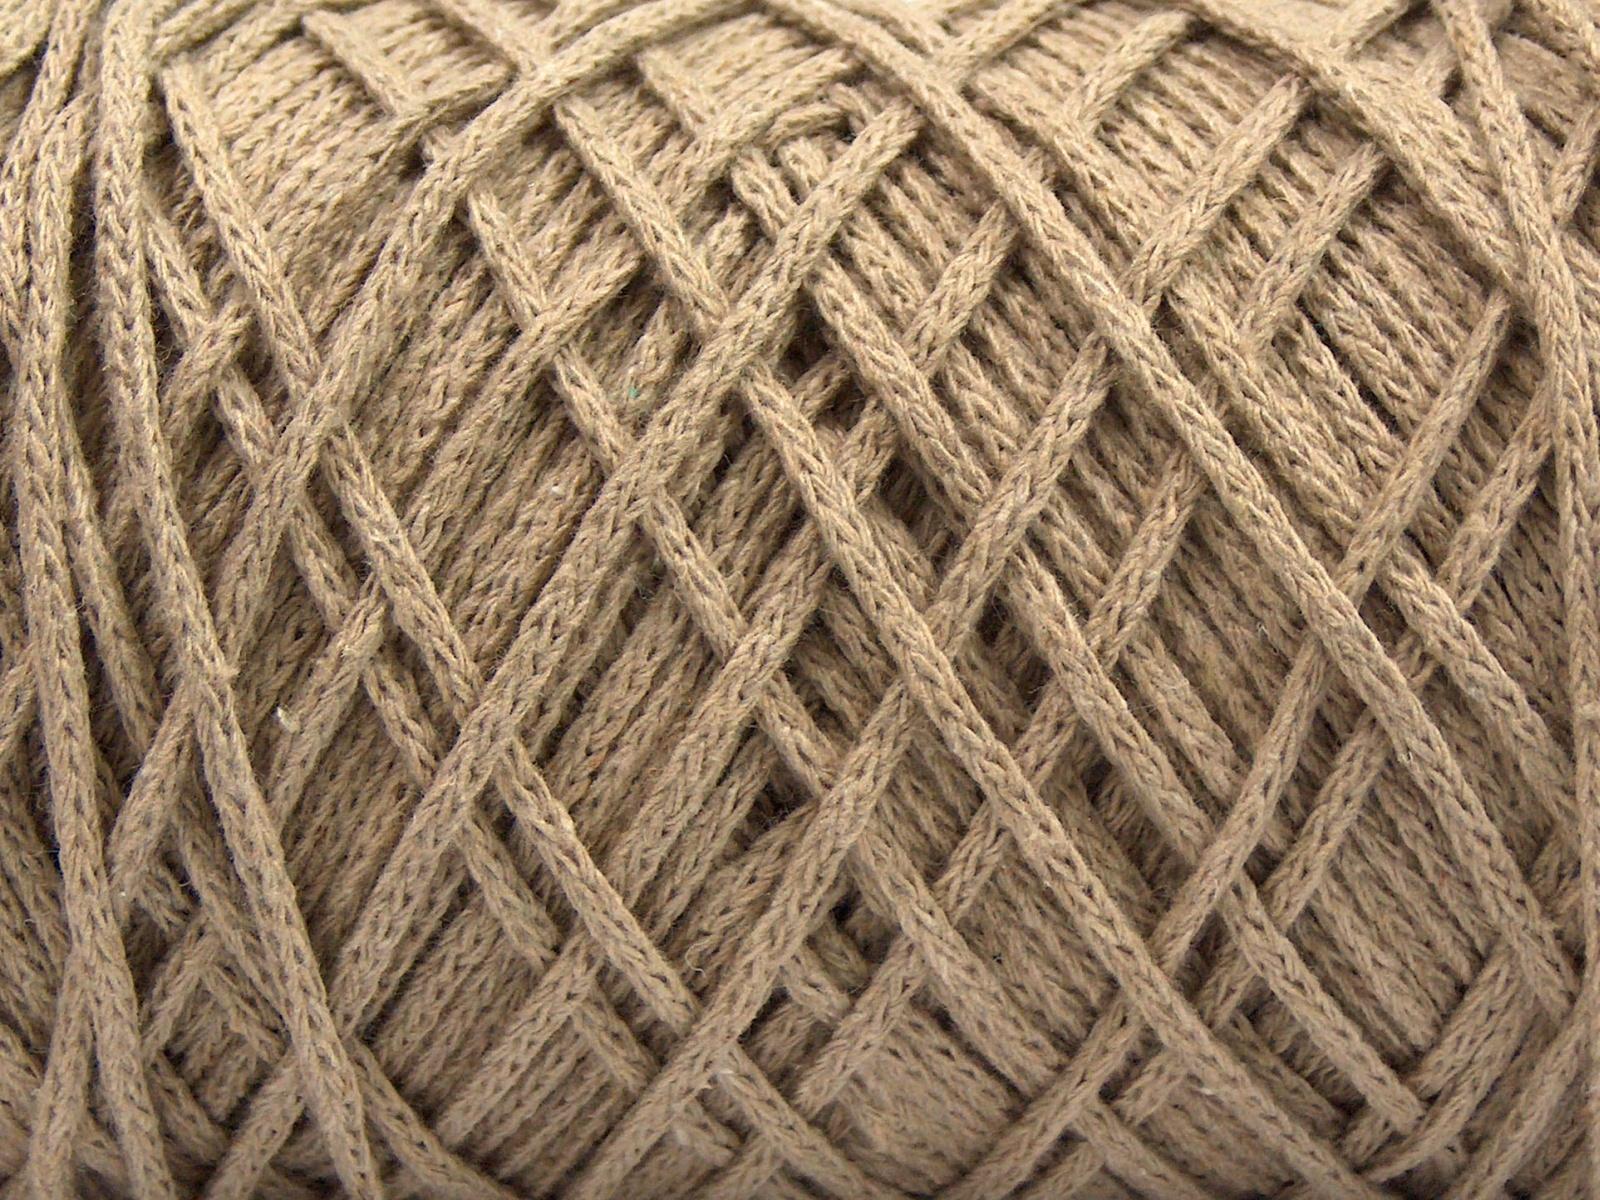 Ice Yarns SMOOTH FUR Hand Knitting Yarn Beige White 100 gr 90 m